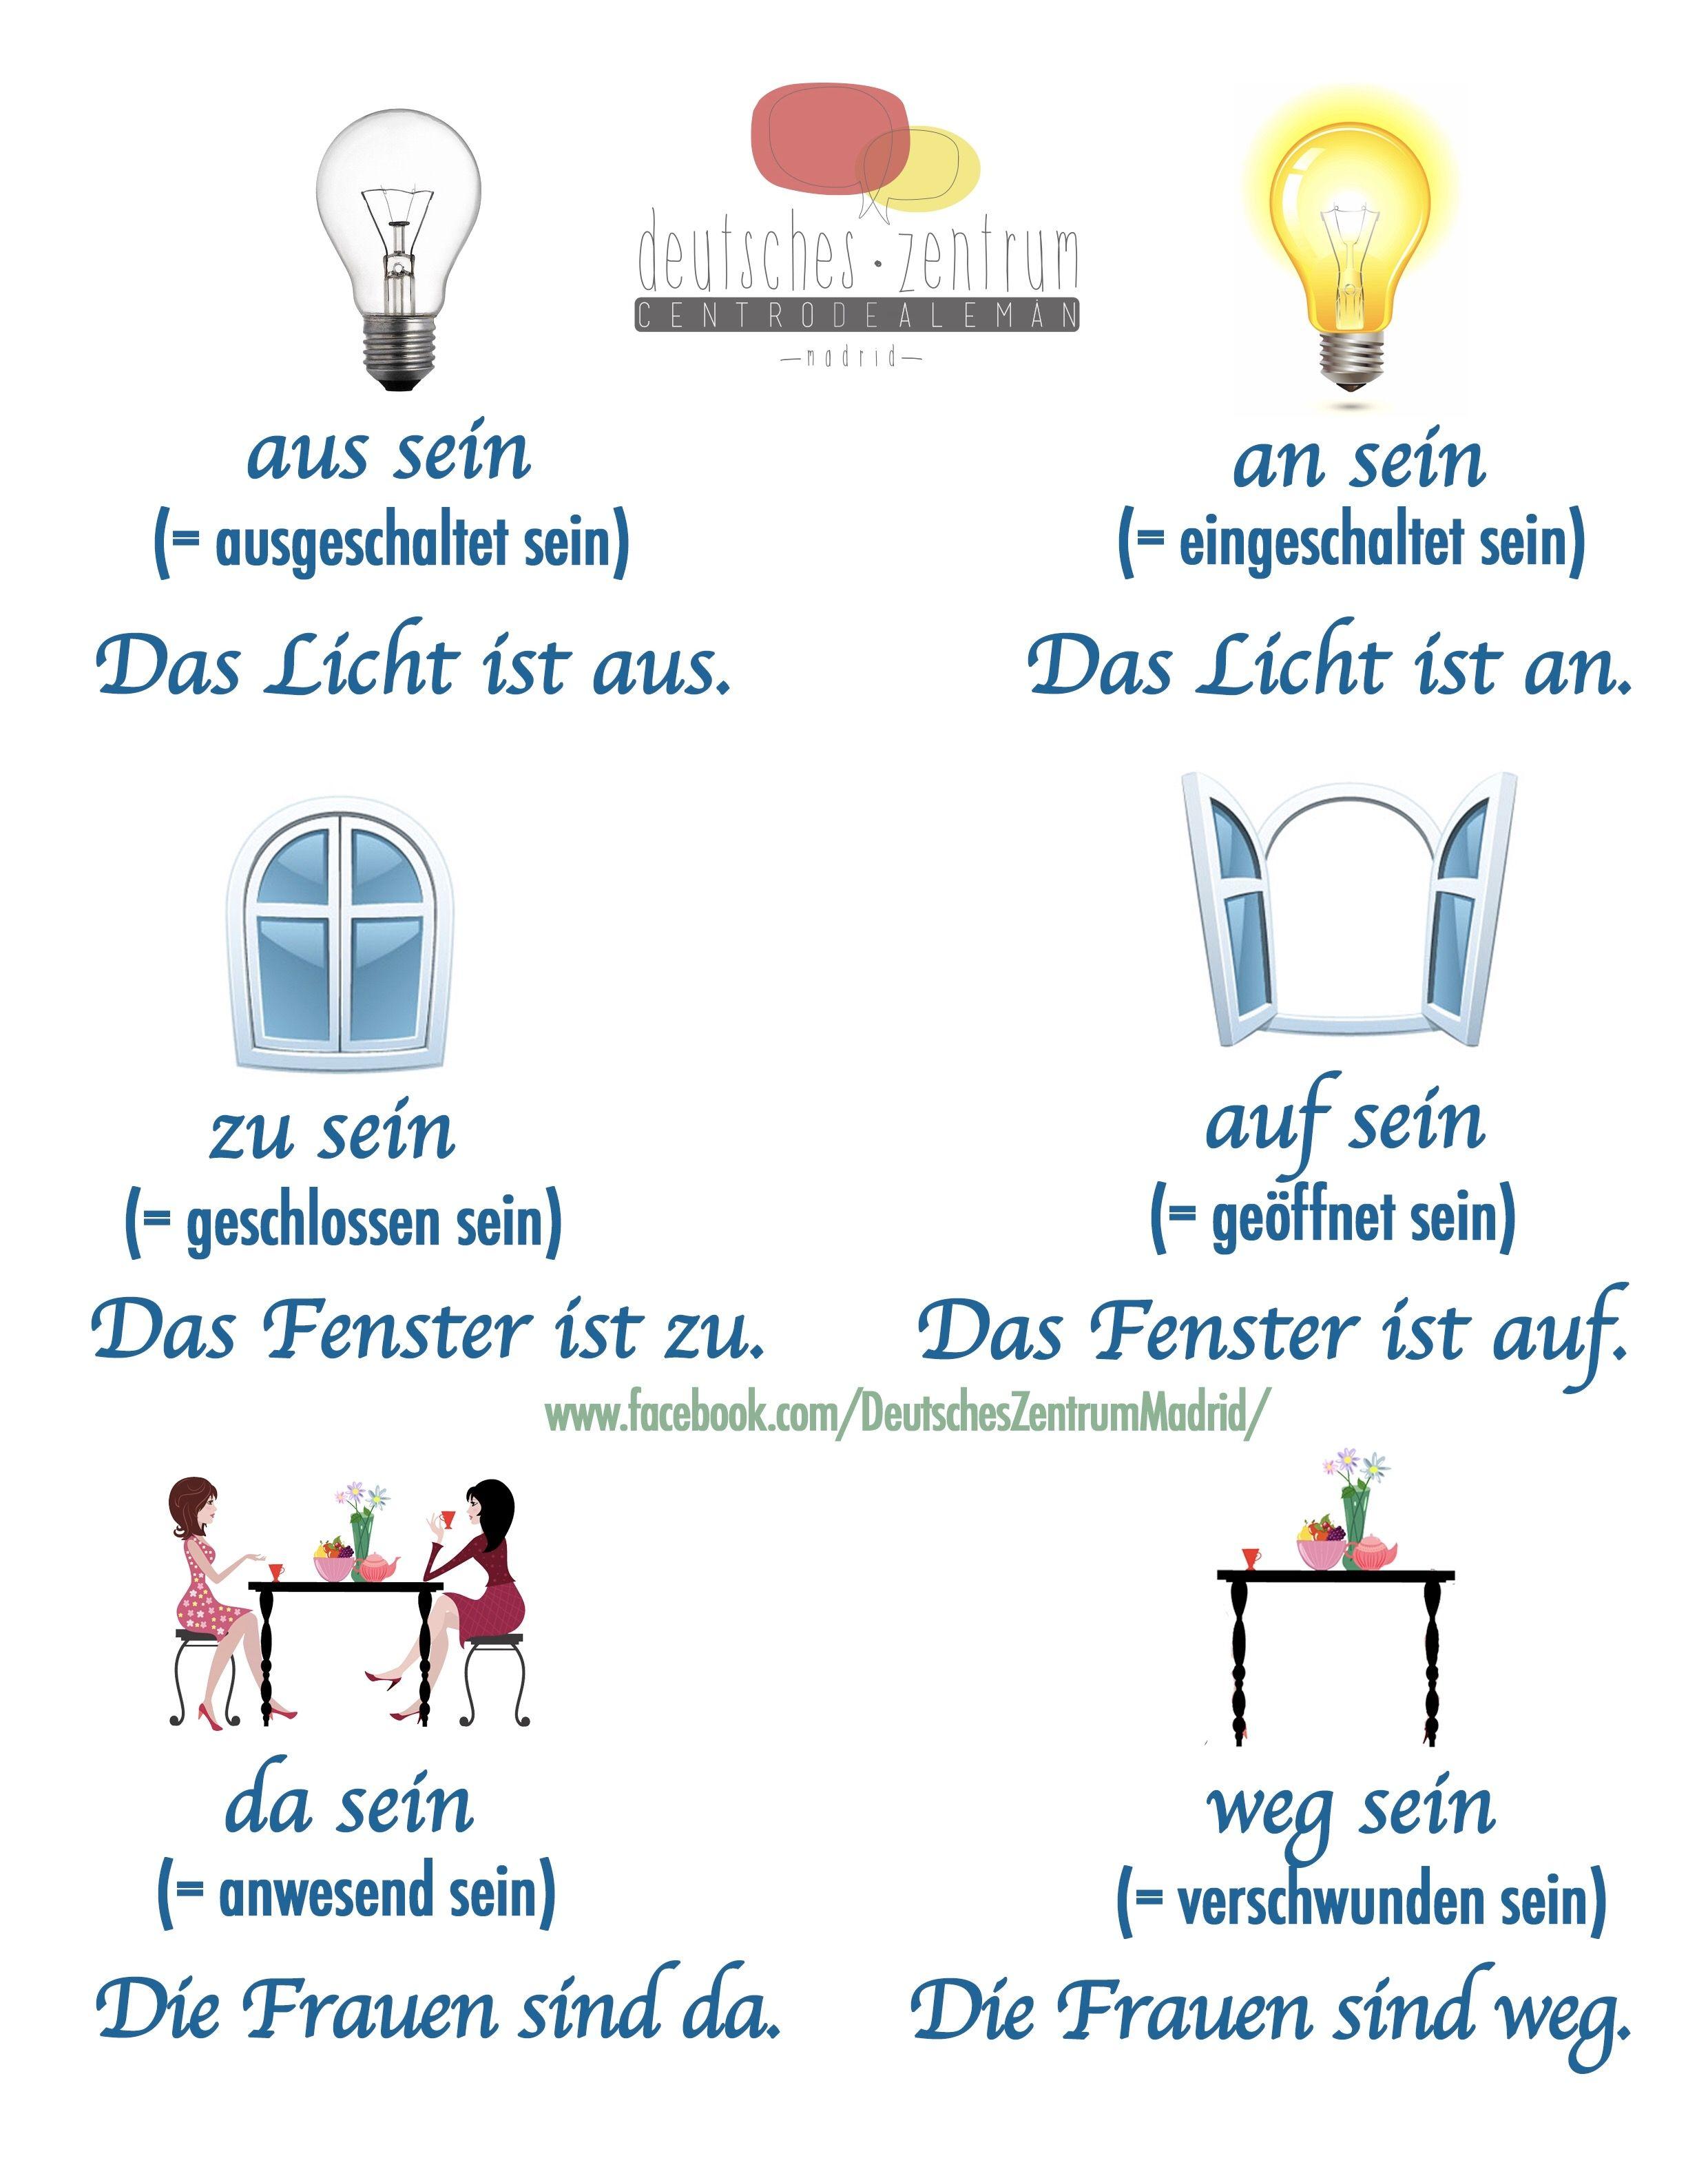 Learn german online with DeutschLern.net - …